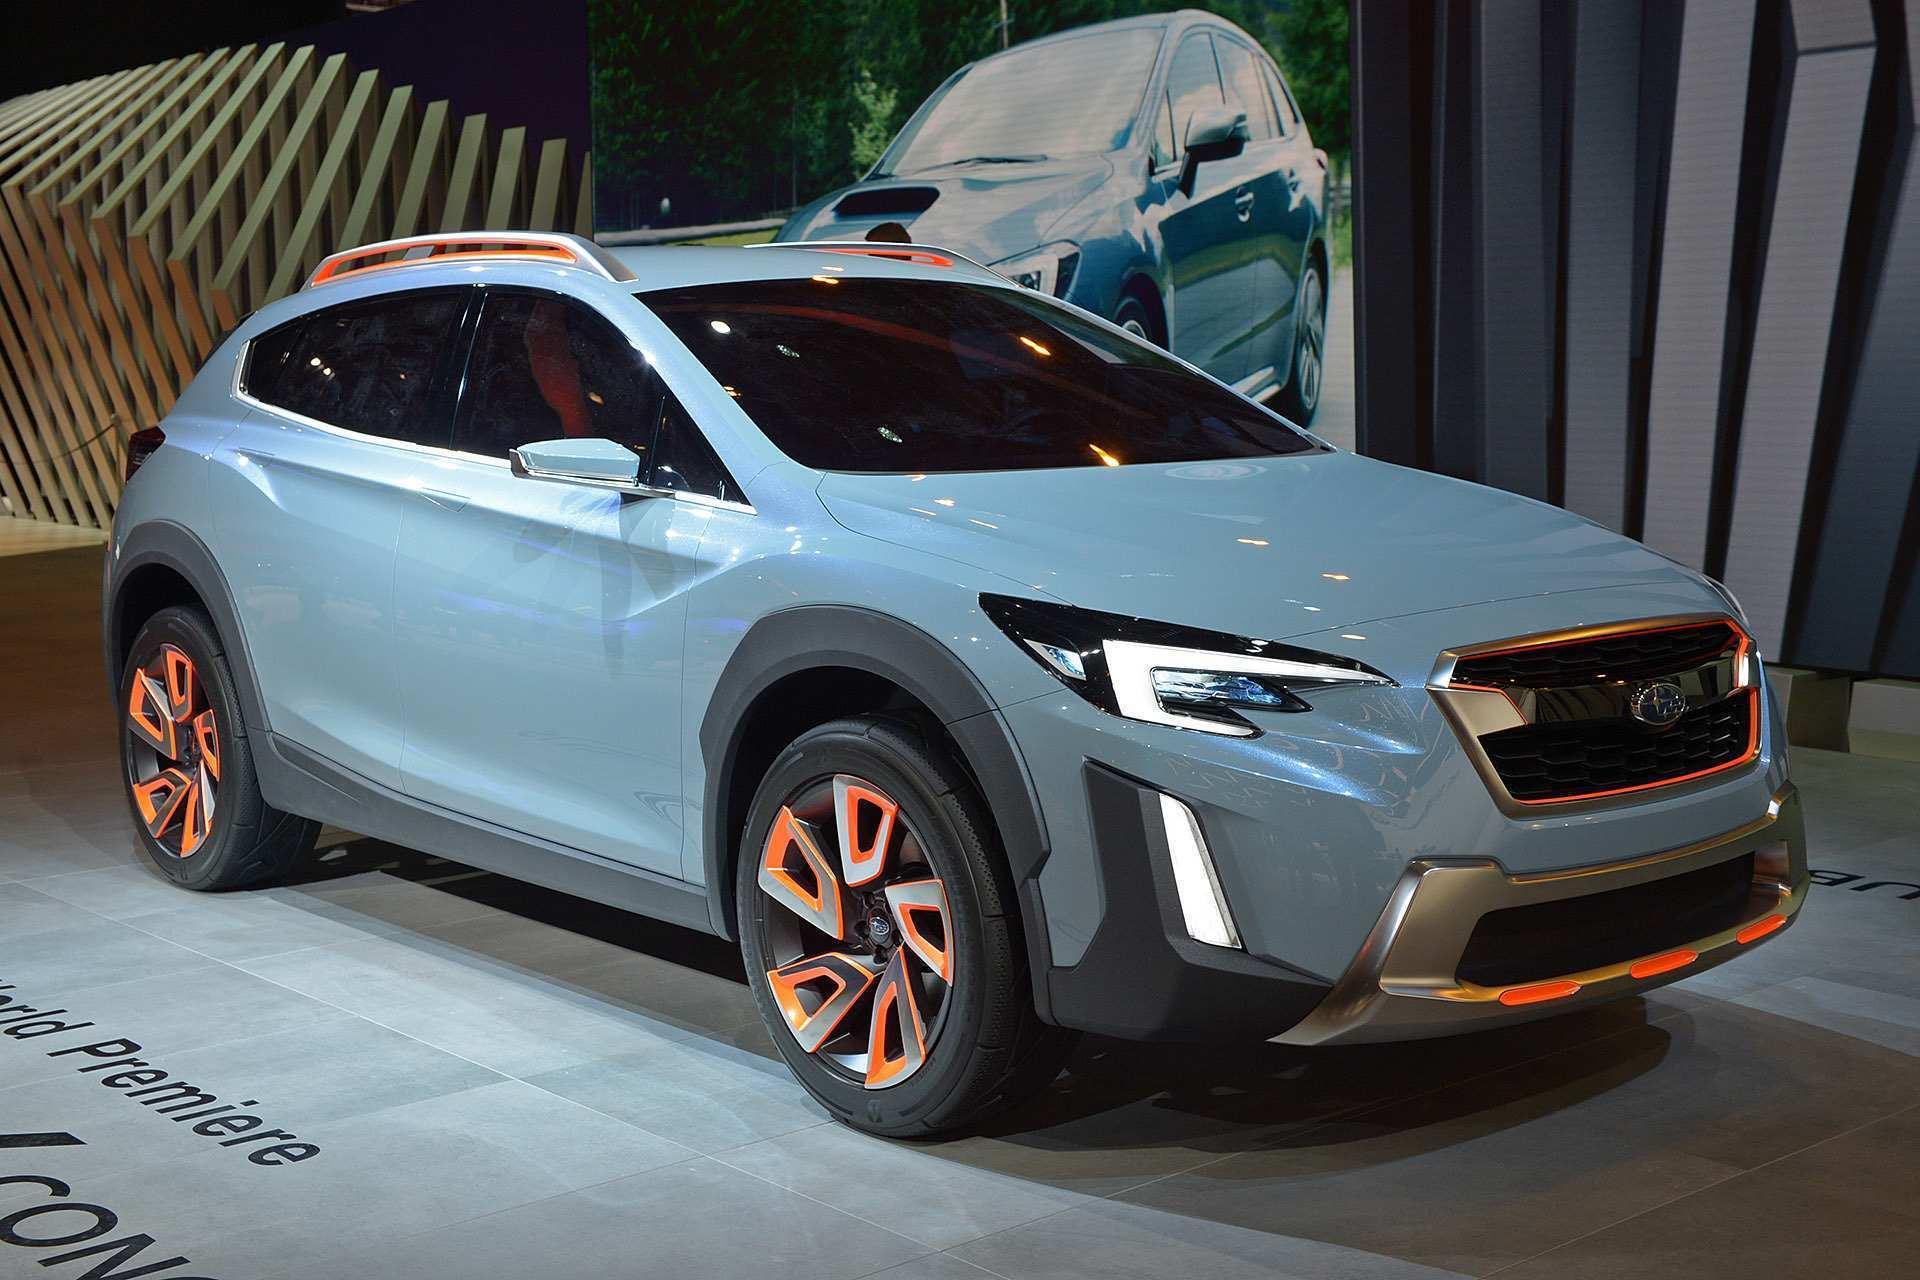 83 New 2019 Subaru Crosstrek Review Price And Release Date Review with 2019 Subaru Crosstrek Review Price And Release Date